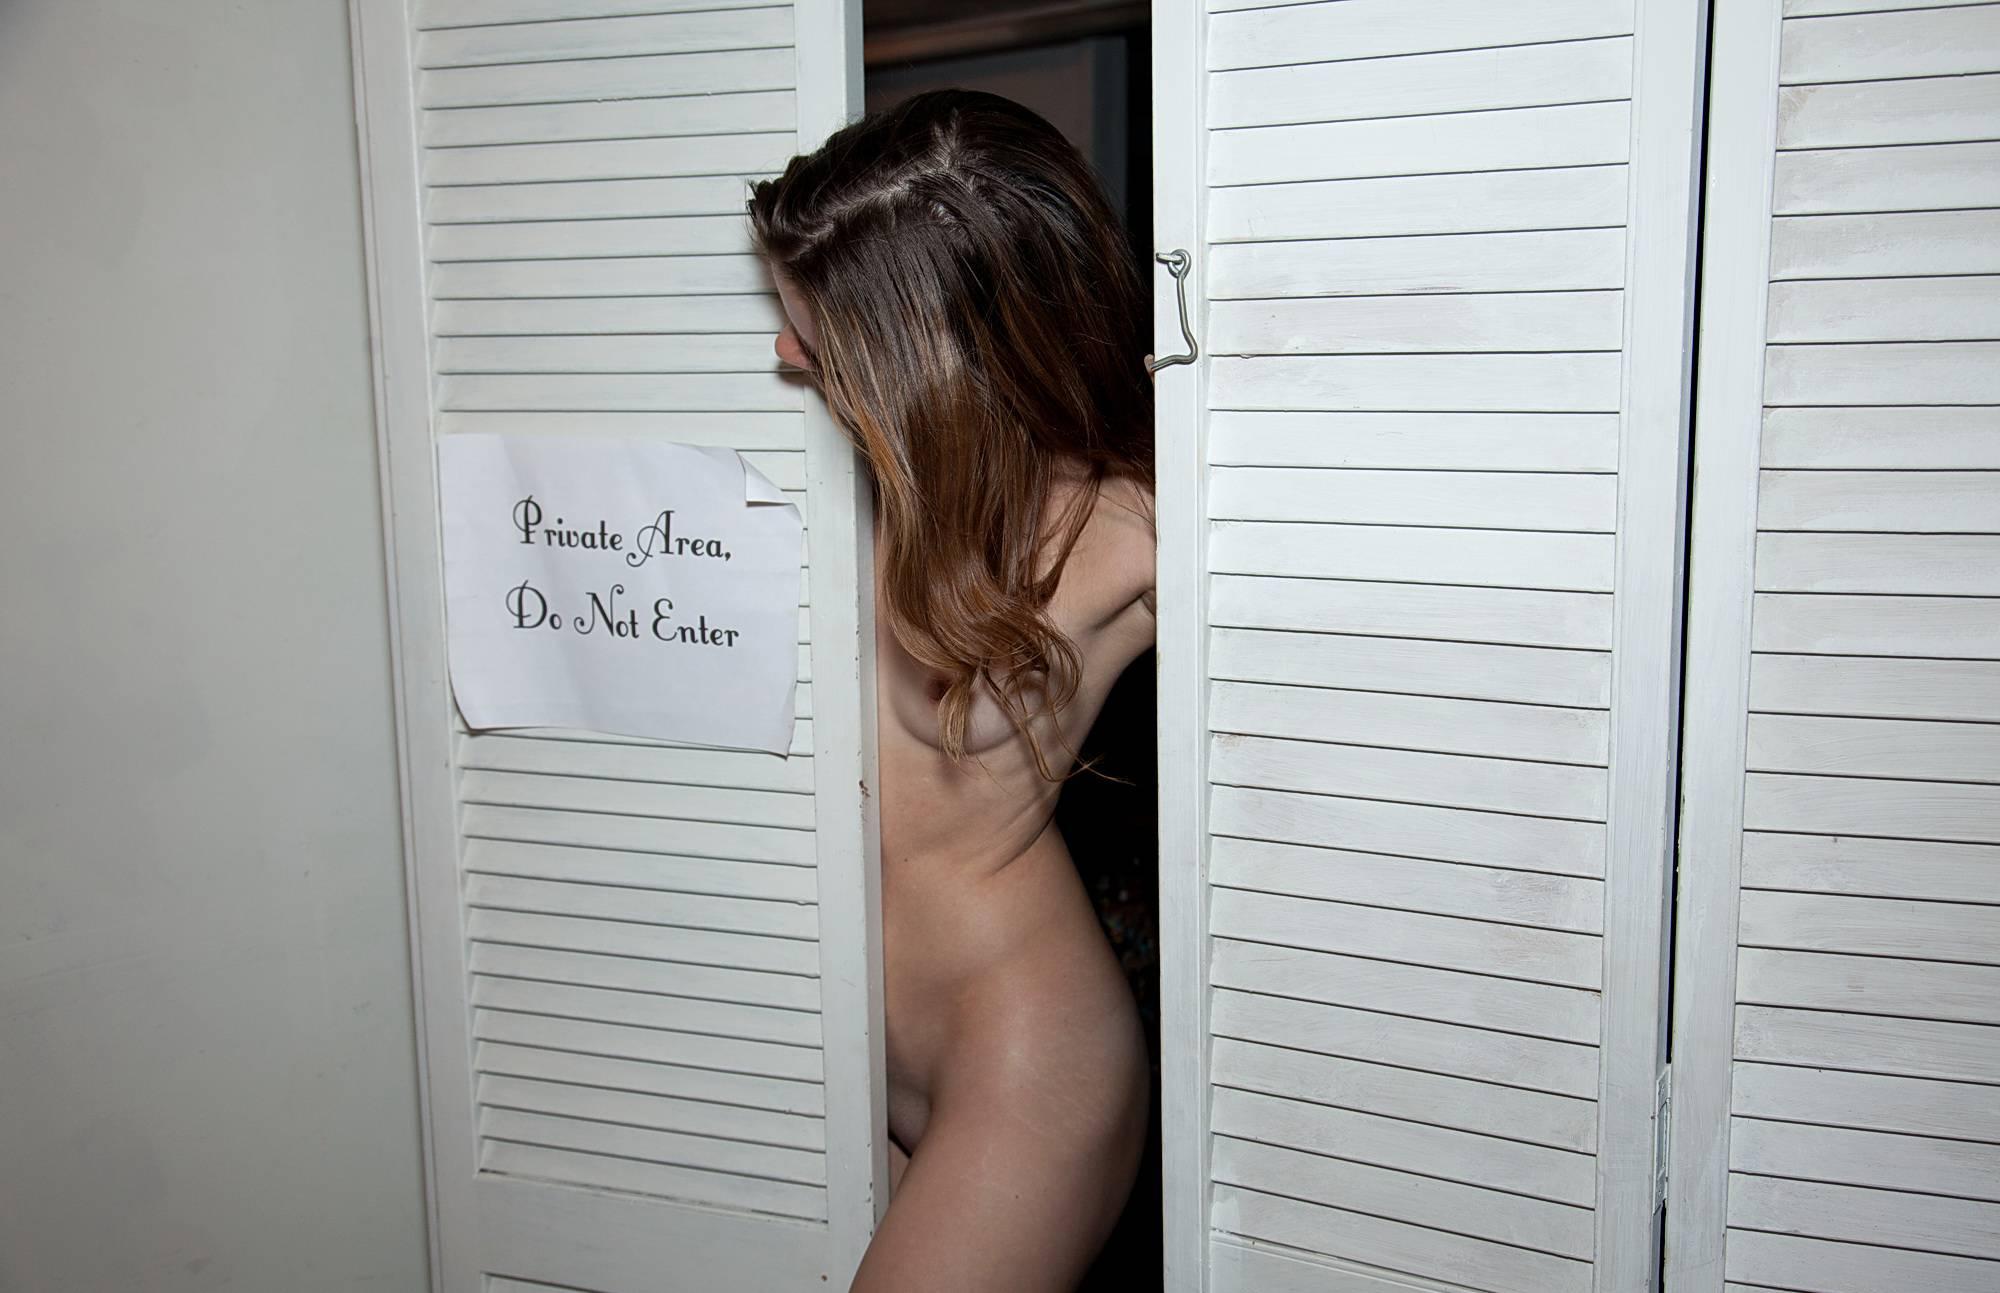 Nudist Pictures Basement Clown Painting - 2